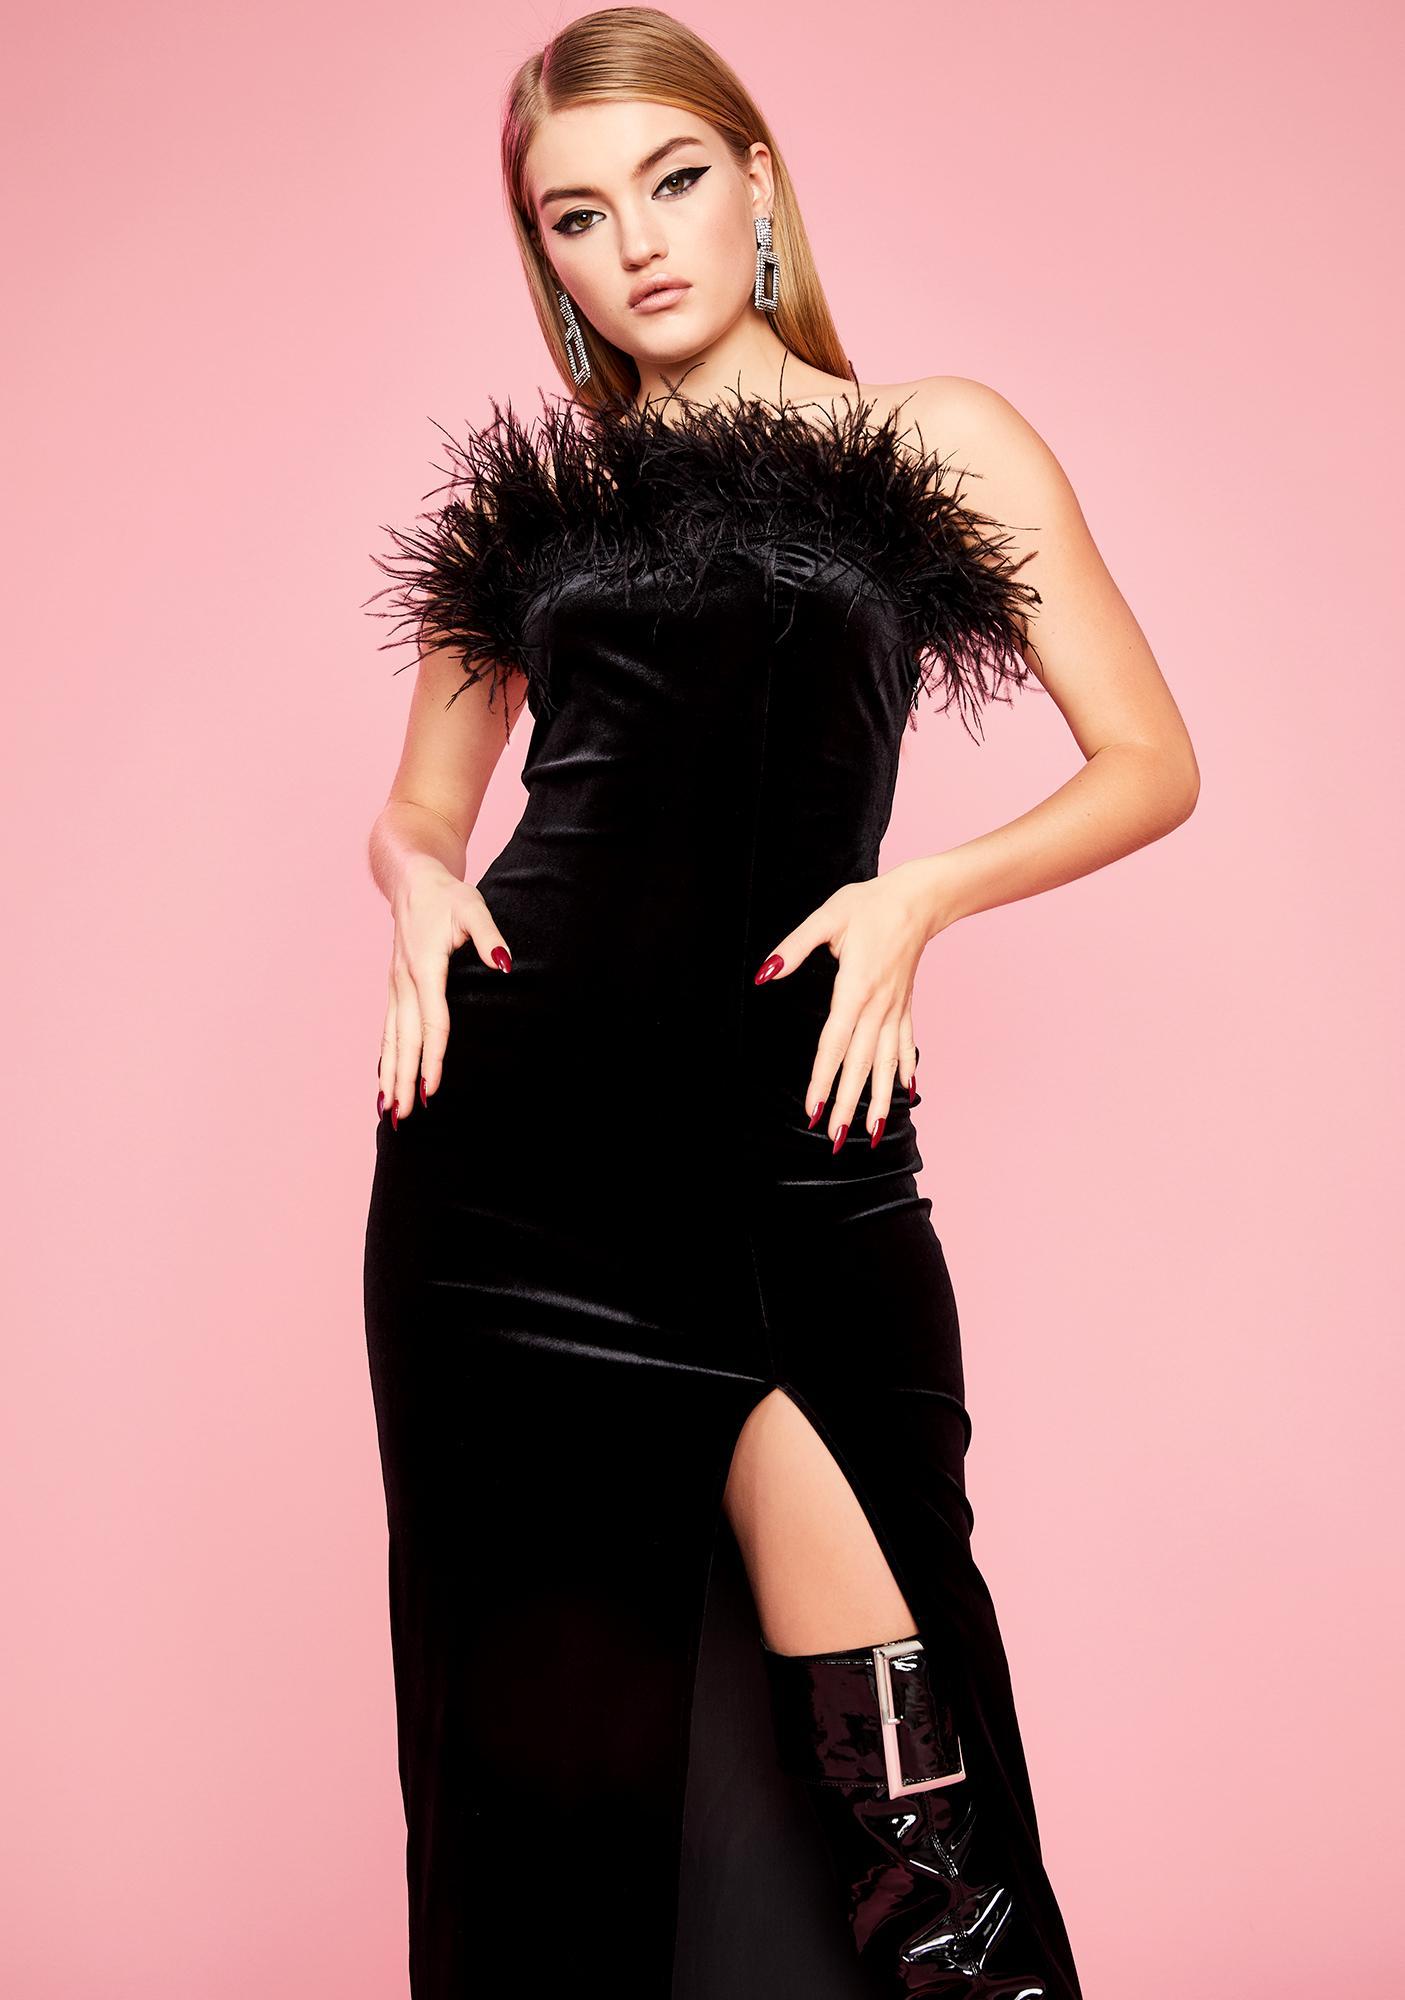 Sugar Thrillz Private Showing Marabou Dress